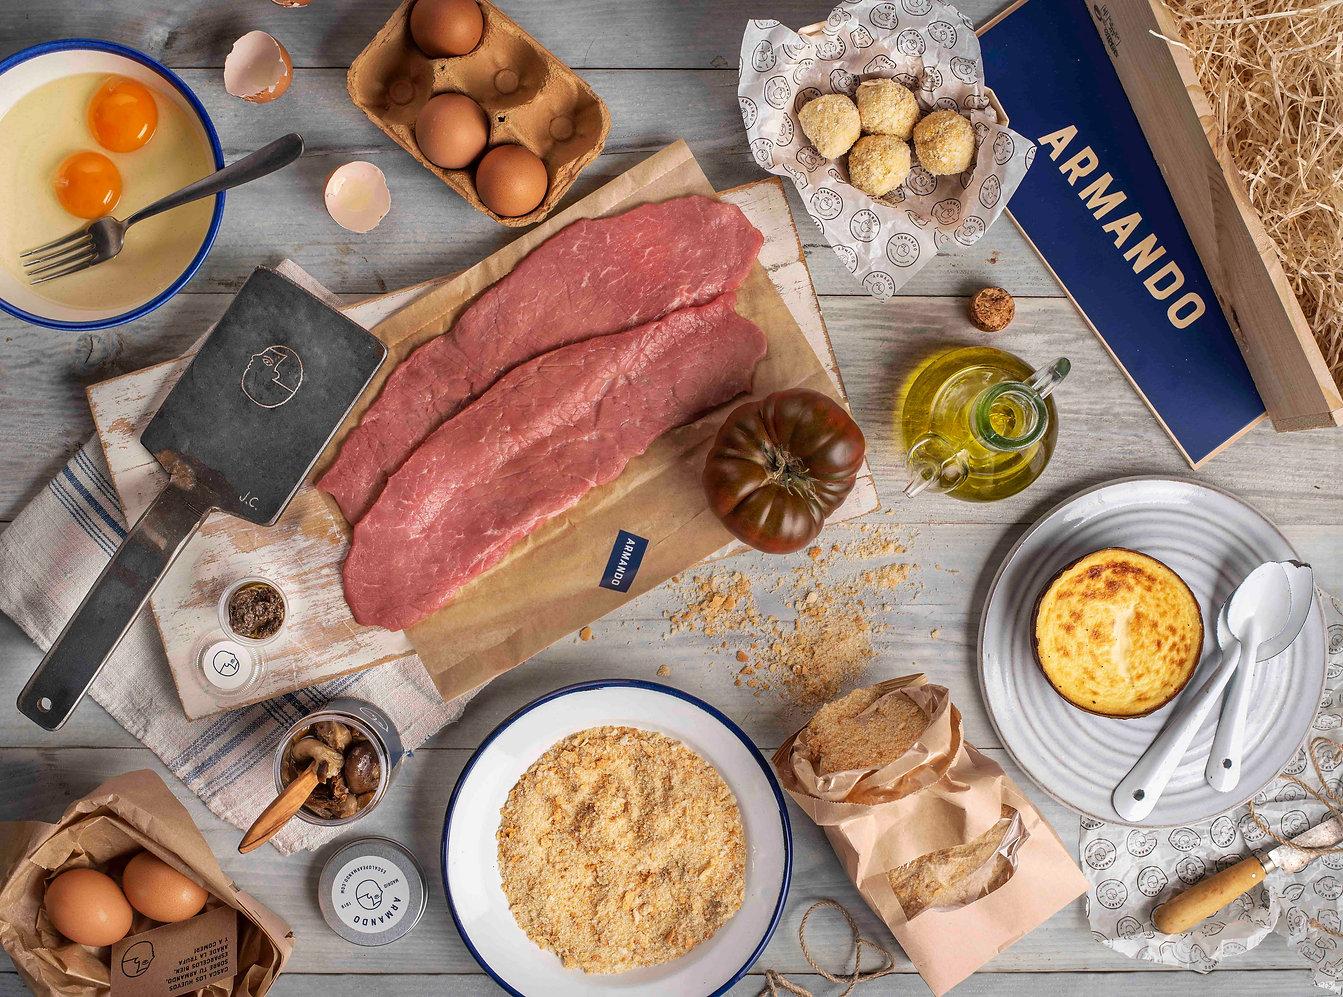 Armando Maker (Planazos GM) - GastroMadrid